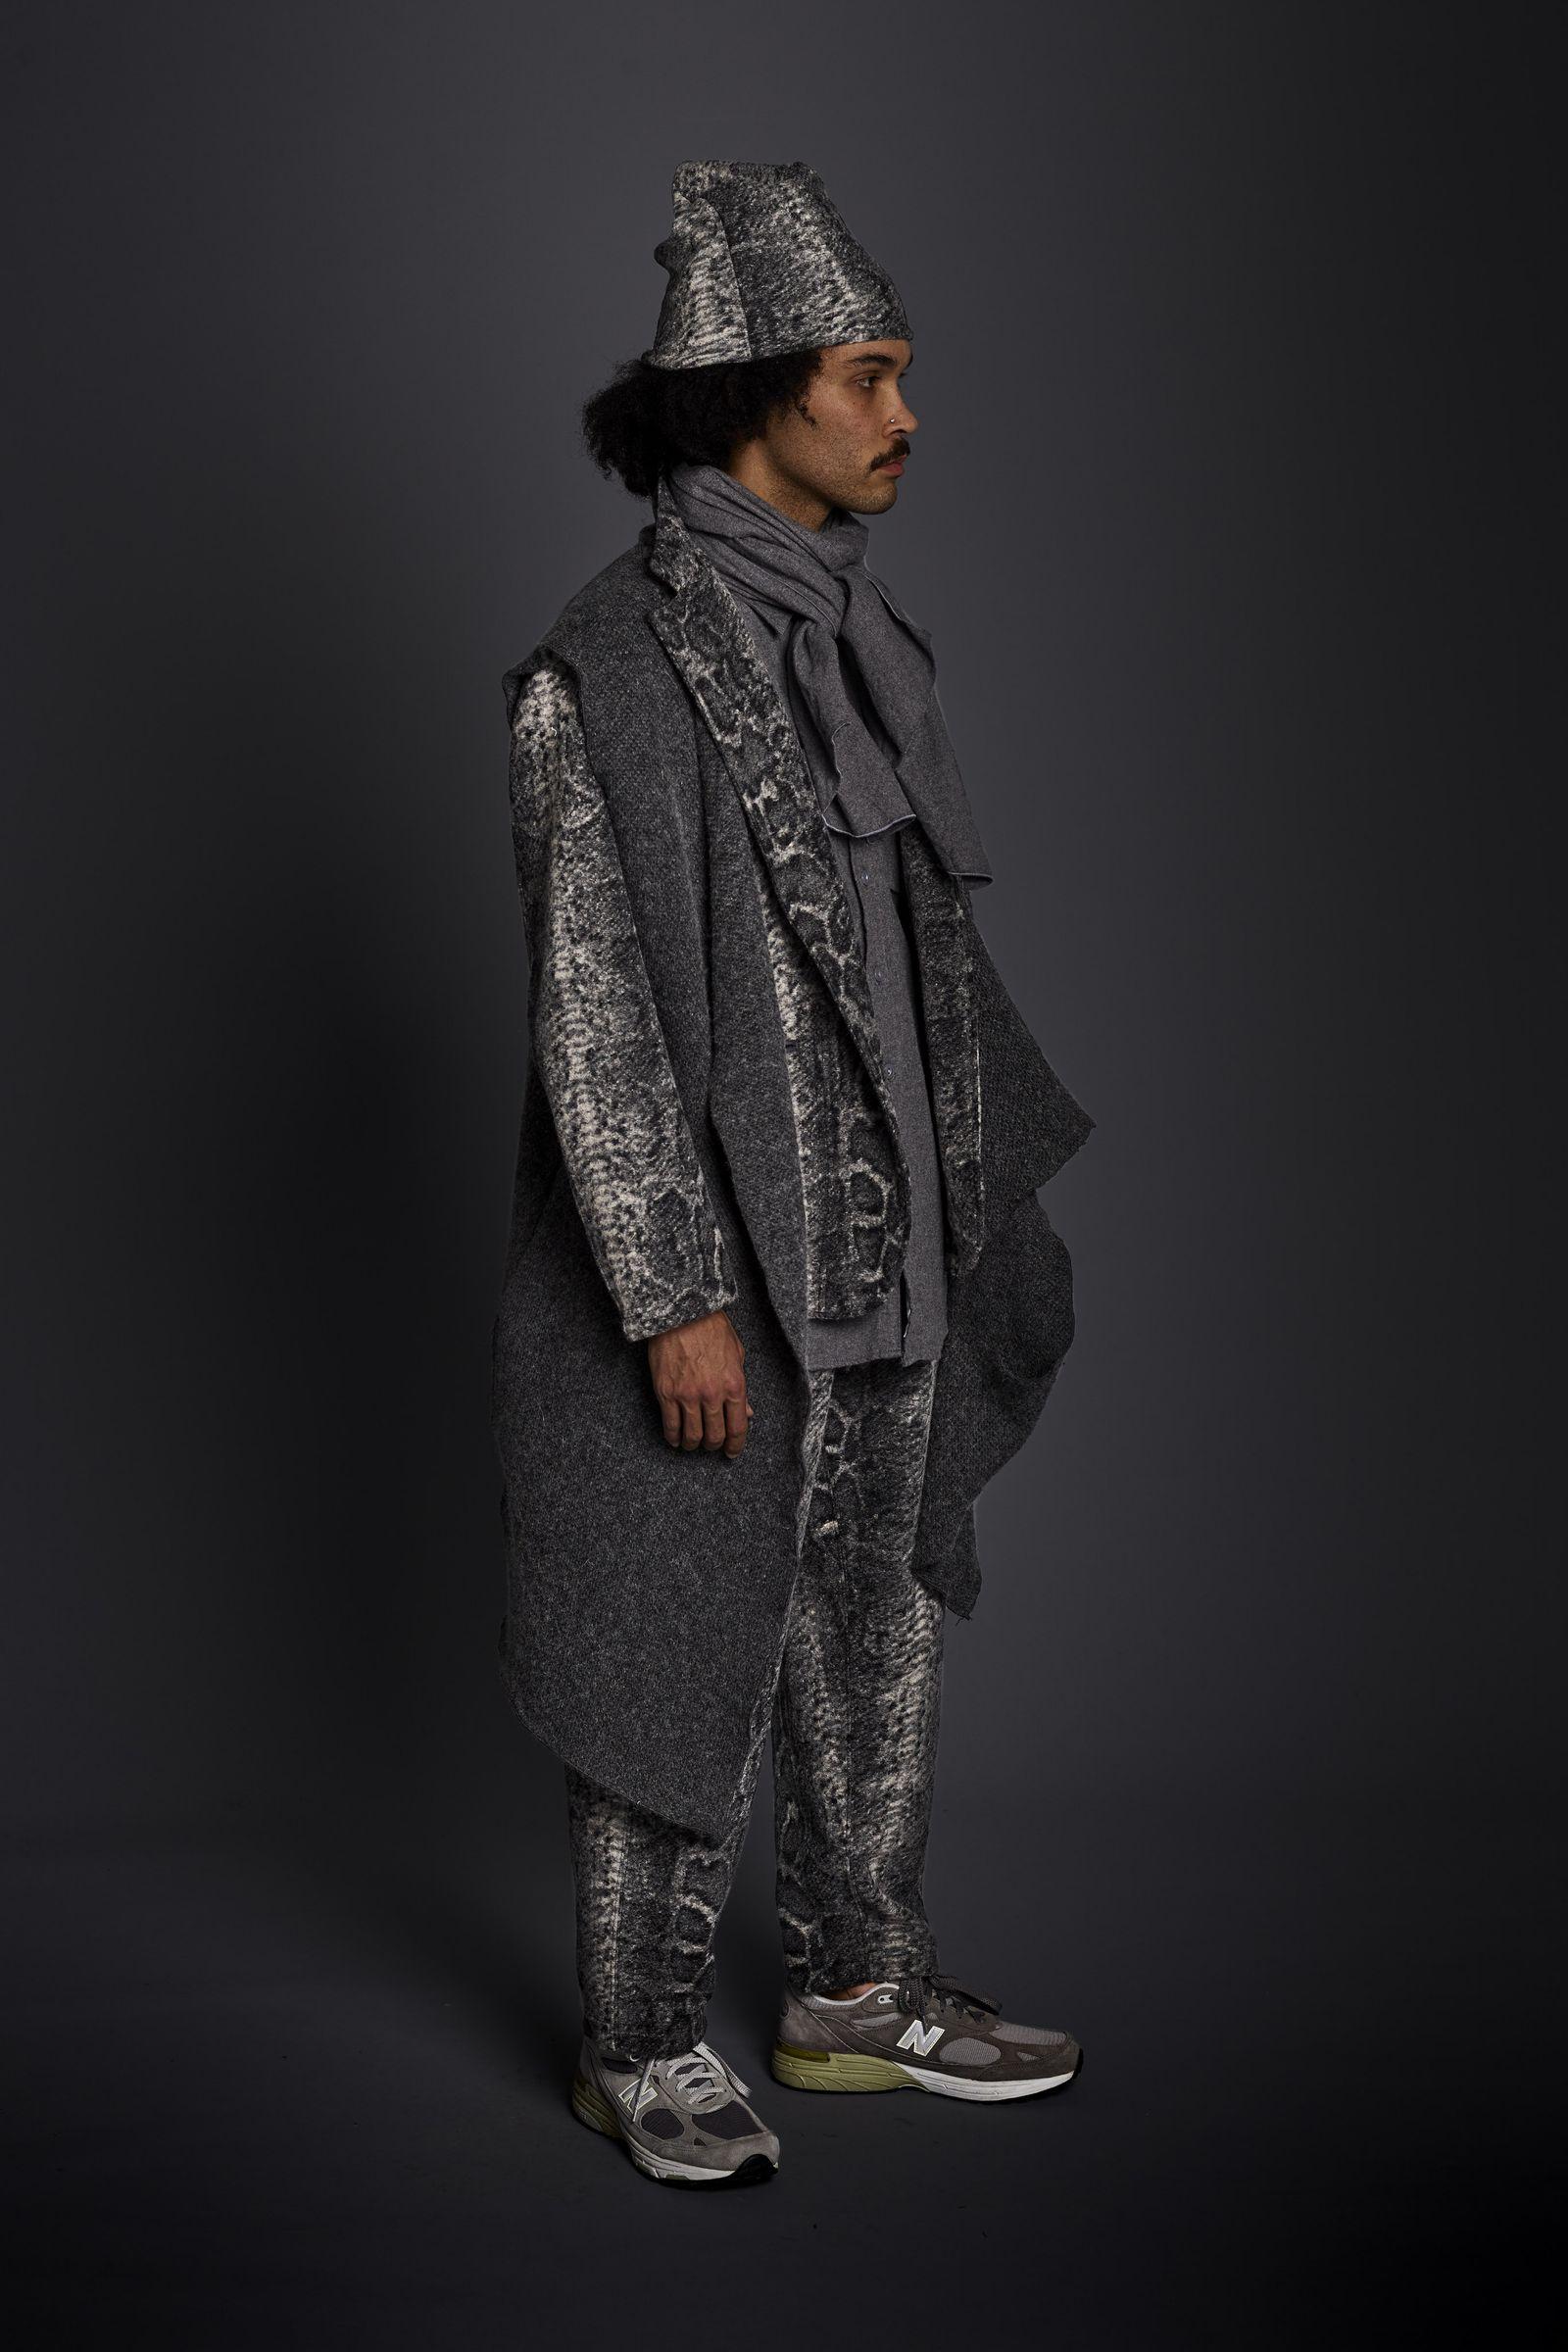 engineered-garments-fall-winter-2020-24